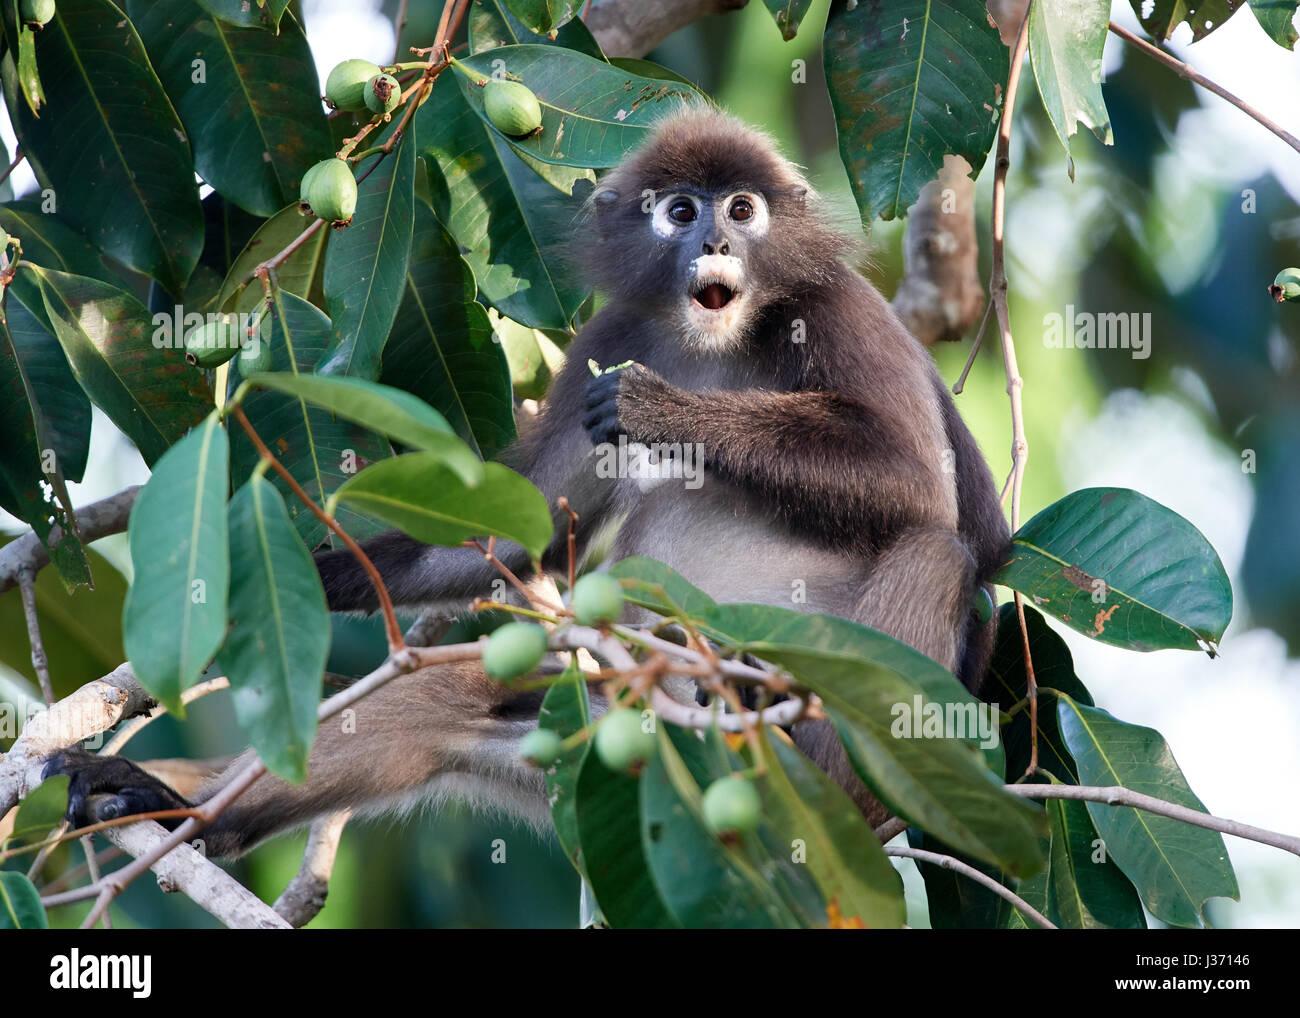 Dusky Leaf Monkey  Spectacled Langur, or Spectacled Leaf Monkey  (Trachypithecus obscurus) - Stock Image